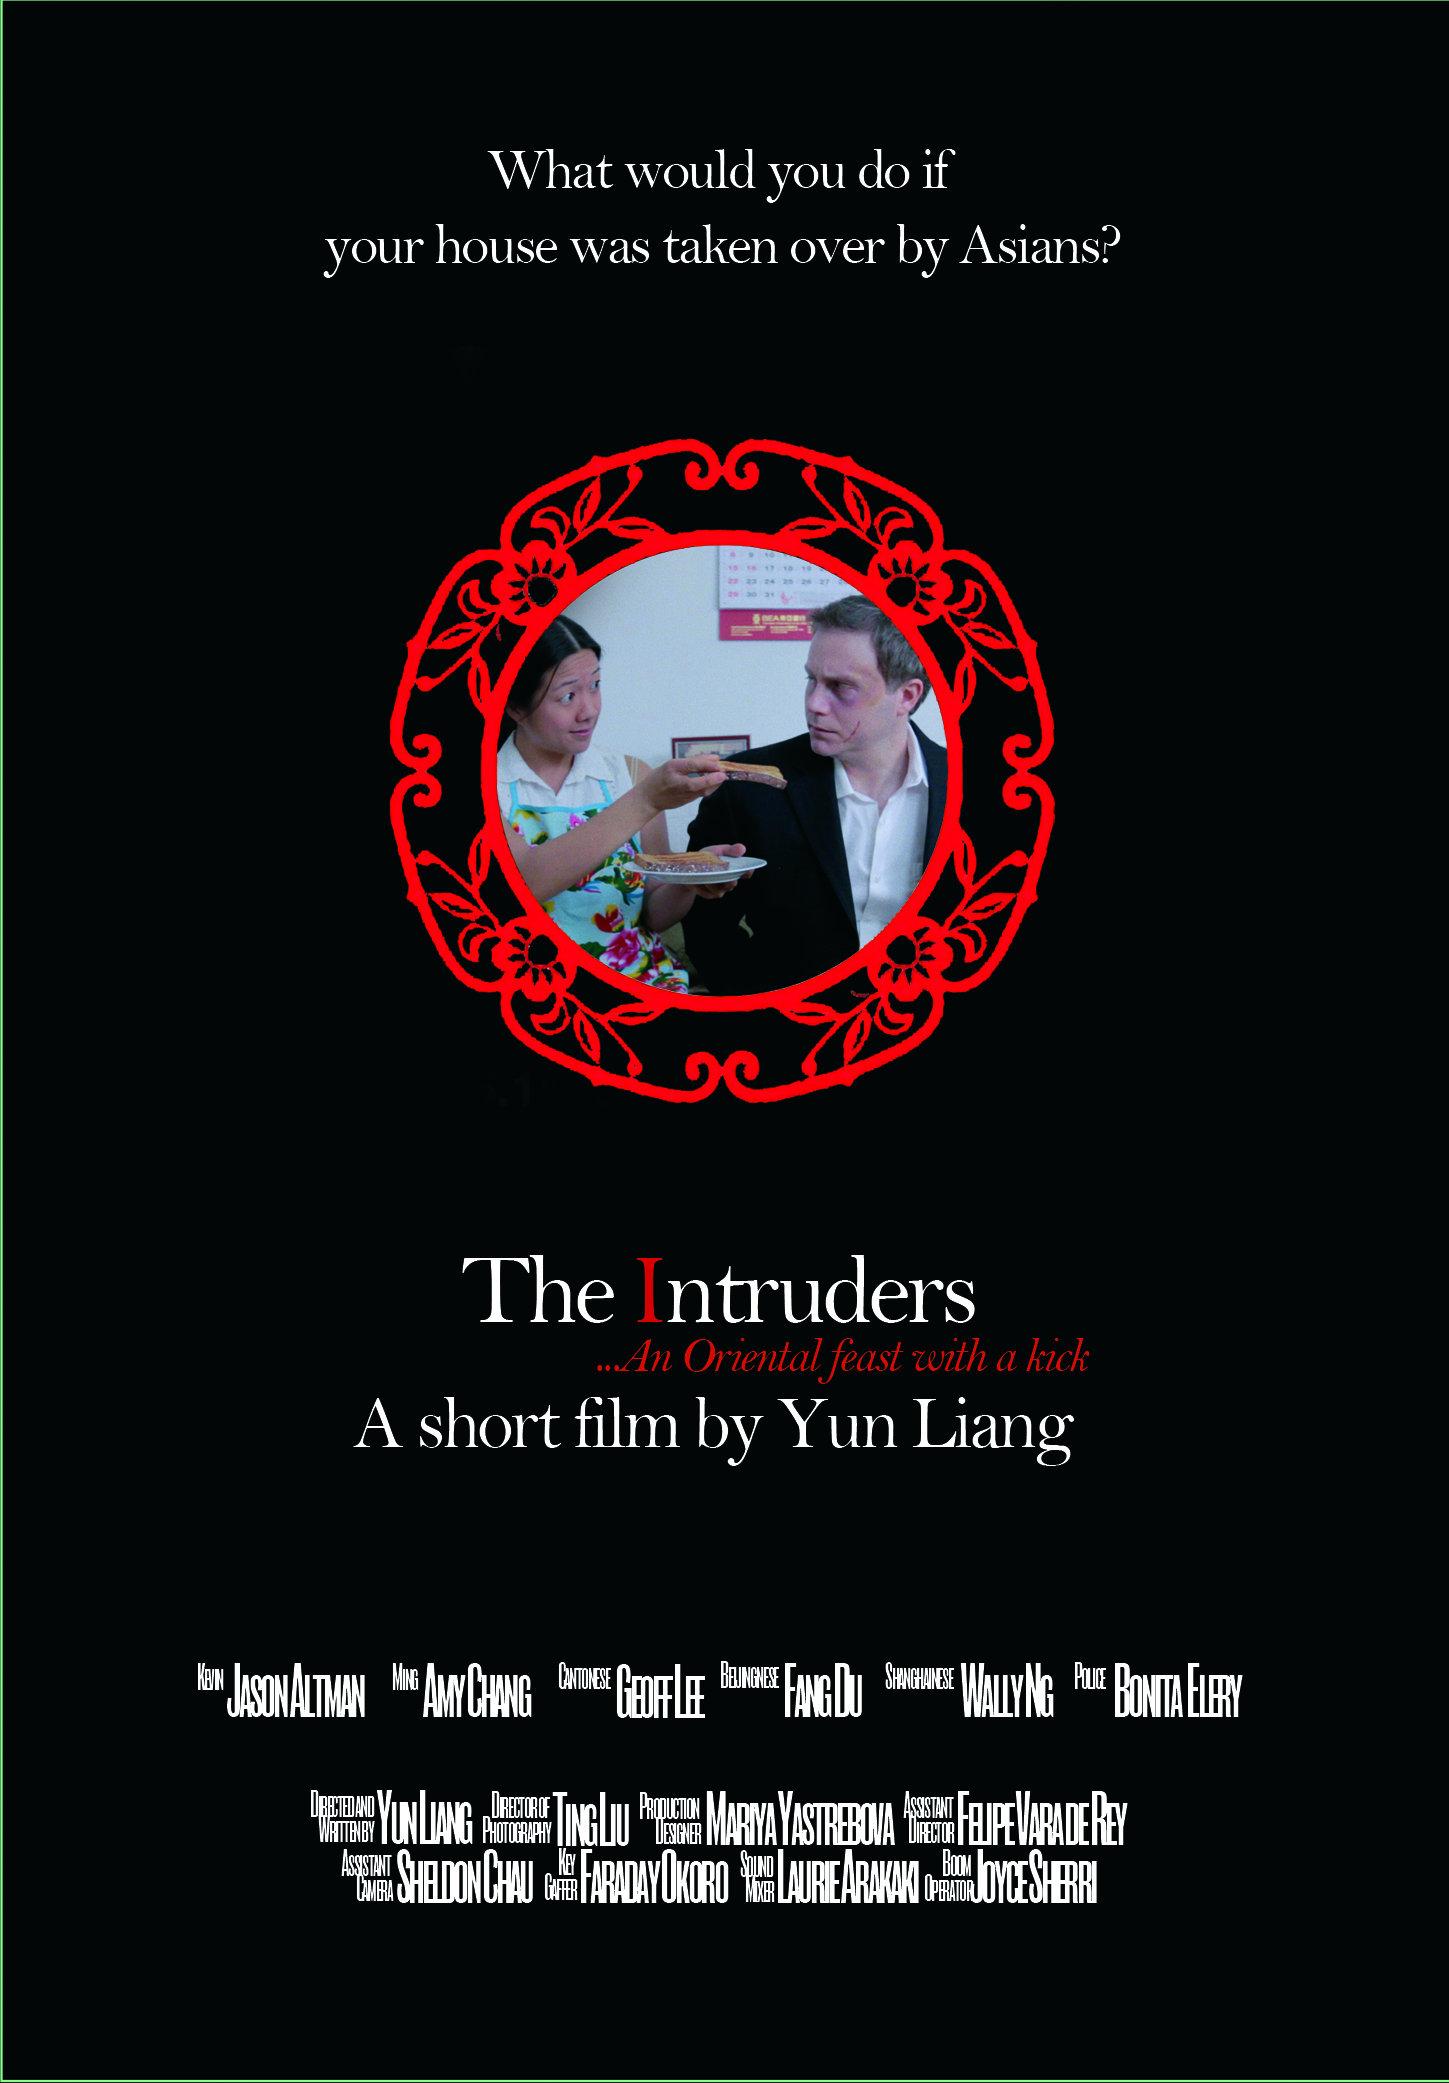 The Intruders (2012)